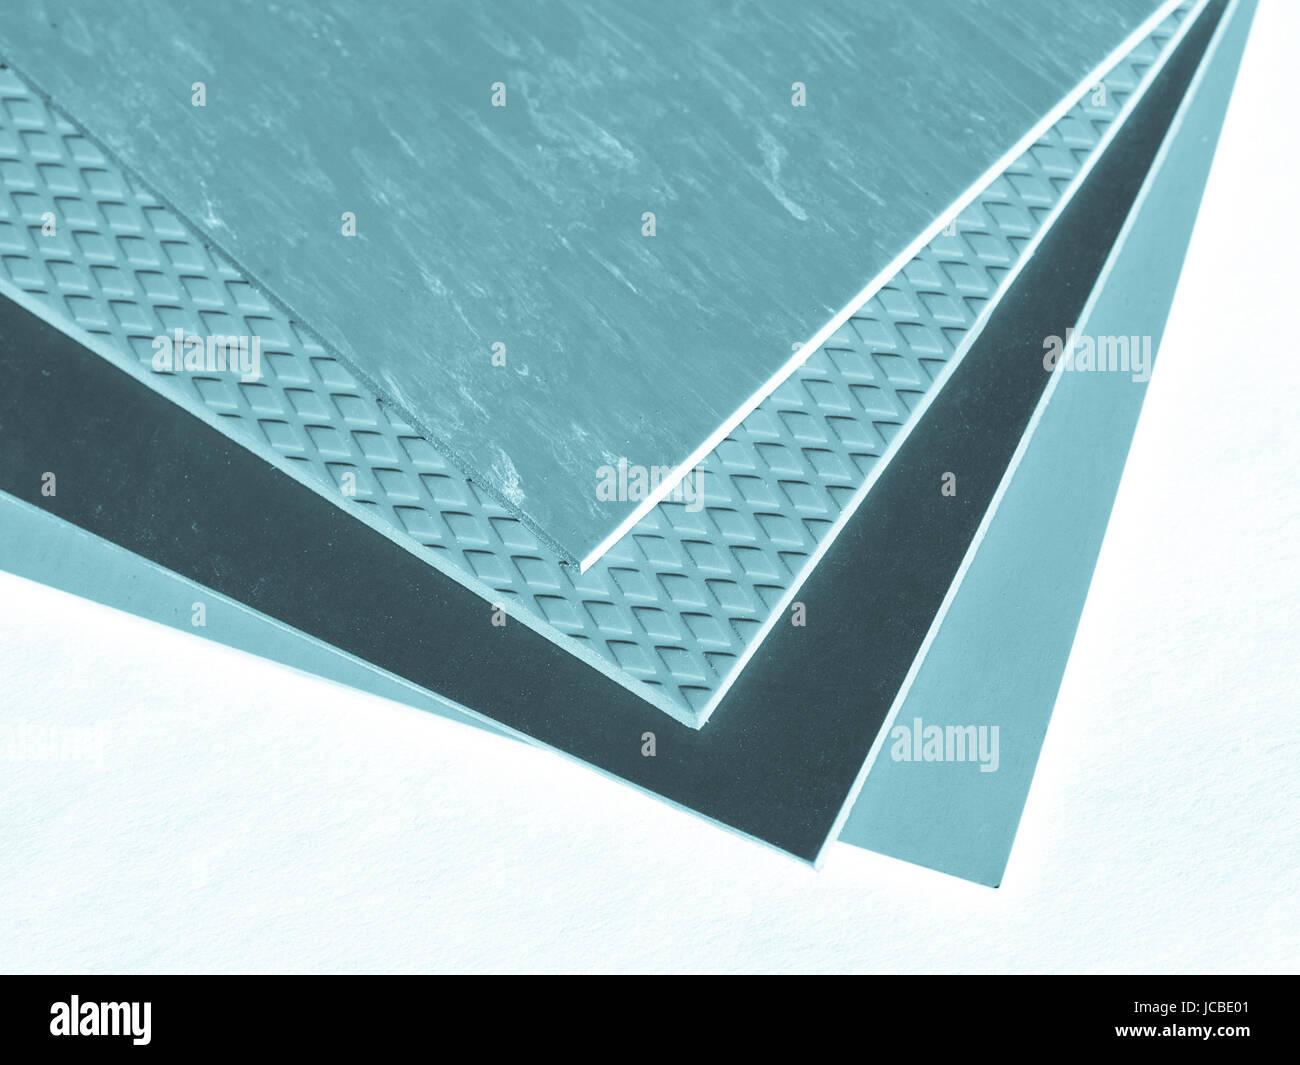 Gomma colorata o linoleum piastrelle per pavimento sampler cool